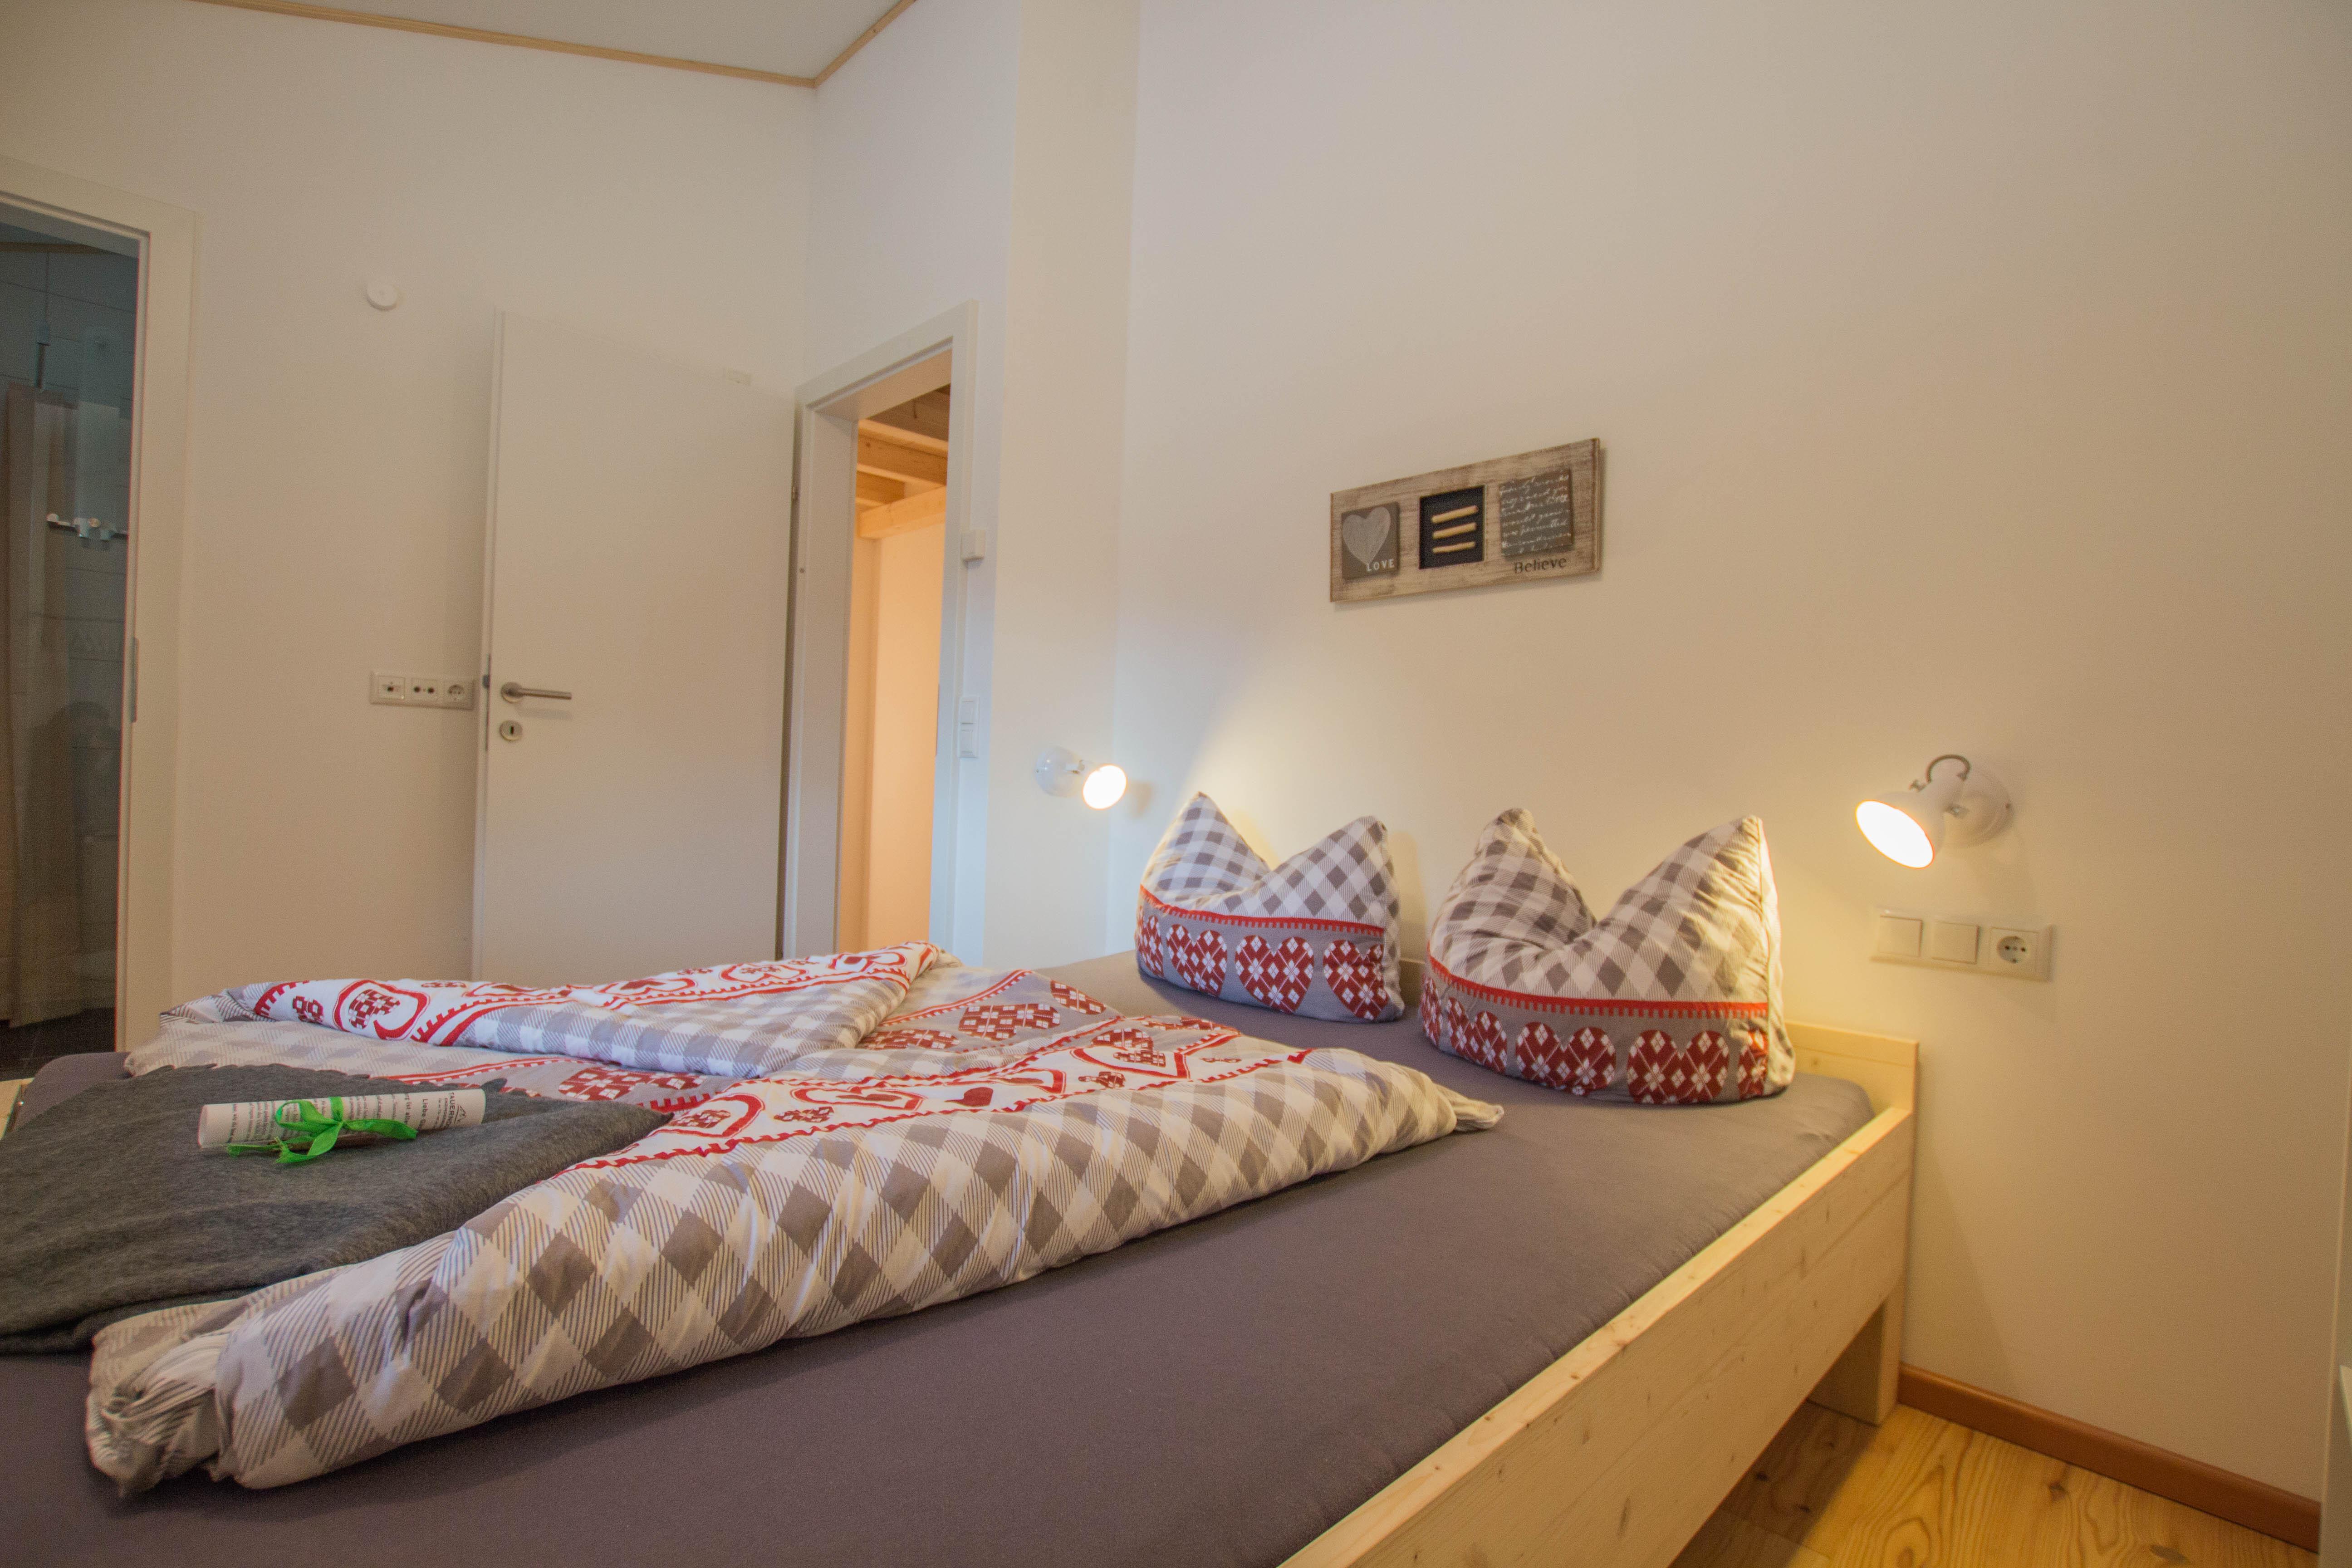 Maison de vacances Lodge Kleiner Bär direkt am Skilift (2050394), Uttendorf, Pinzgau, Salzbourg, Autriche, image 6